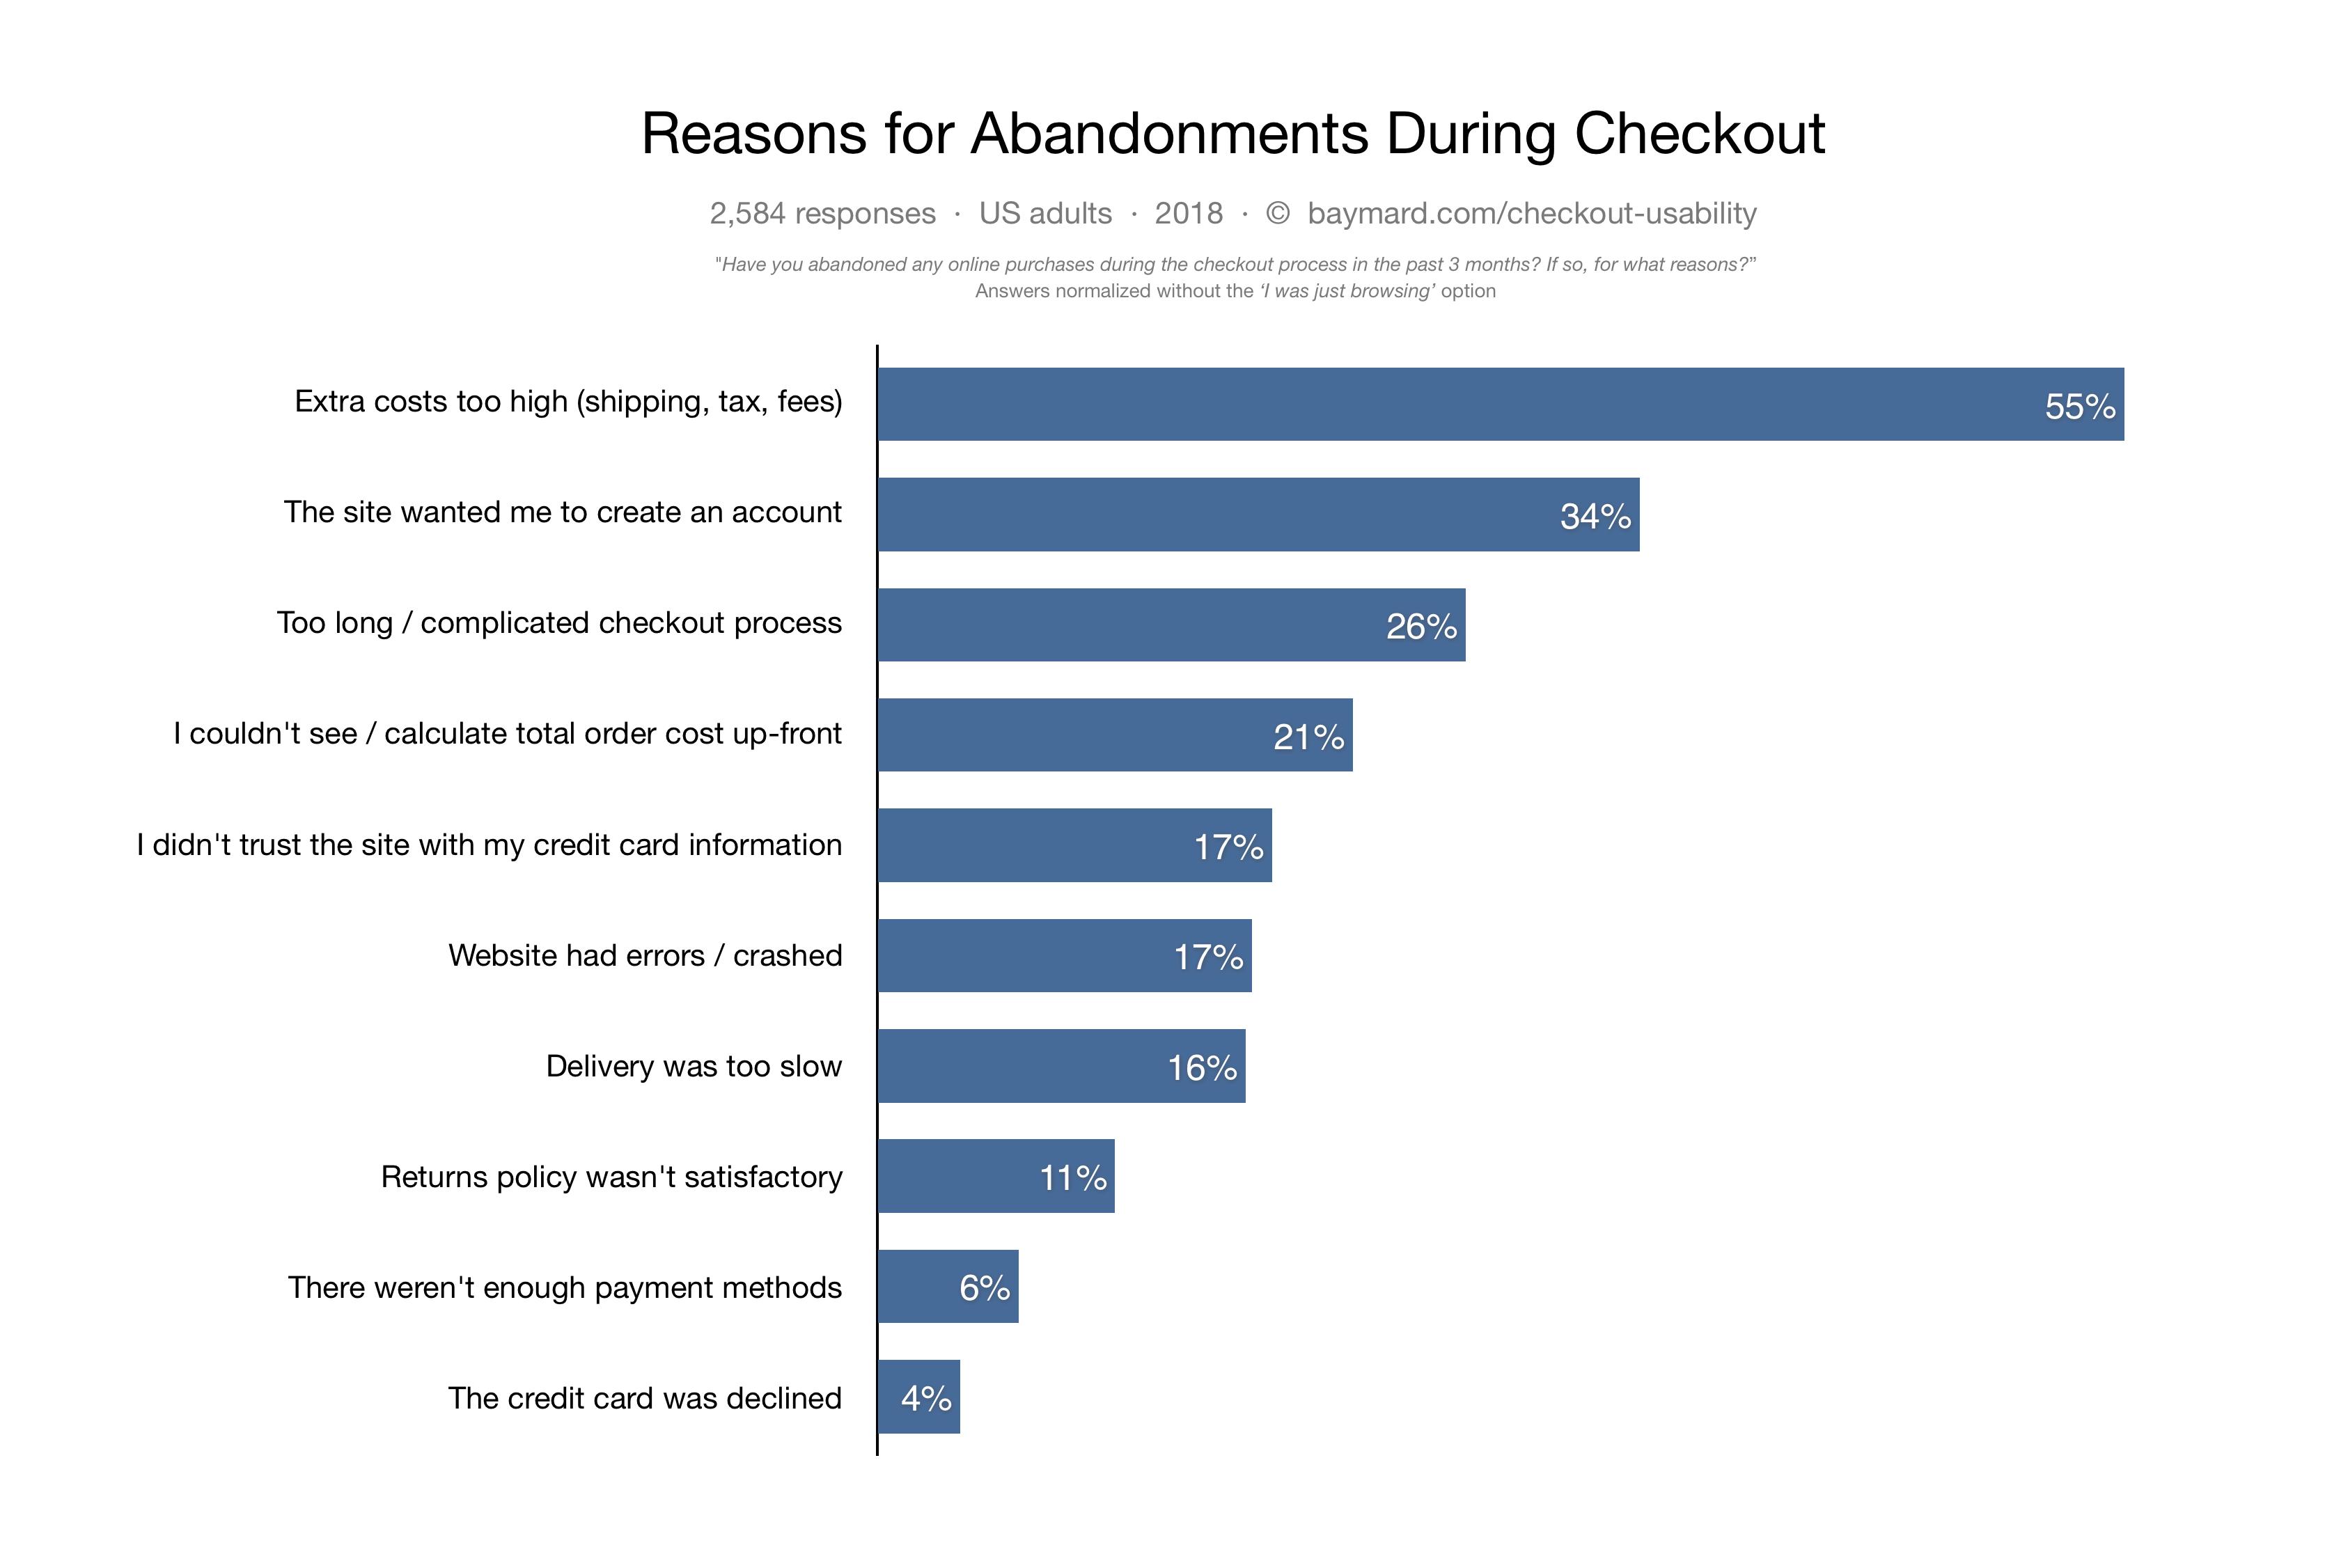 Abandonment reasons chart